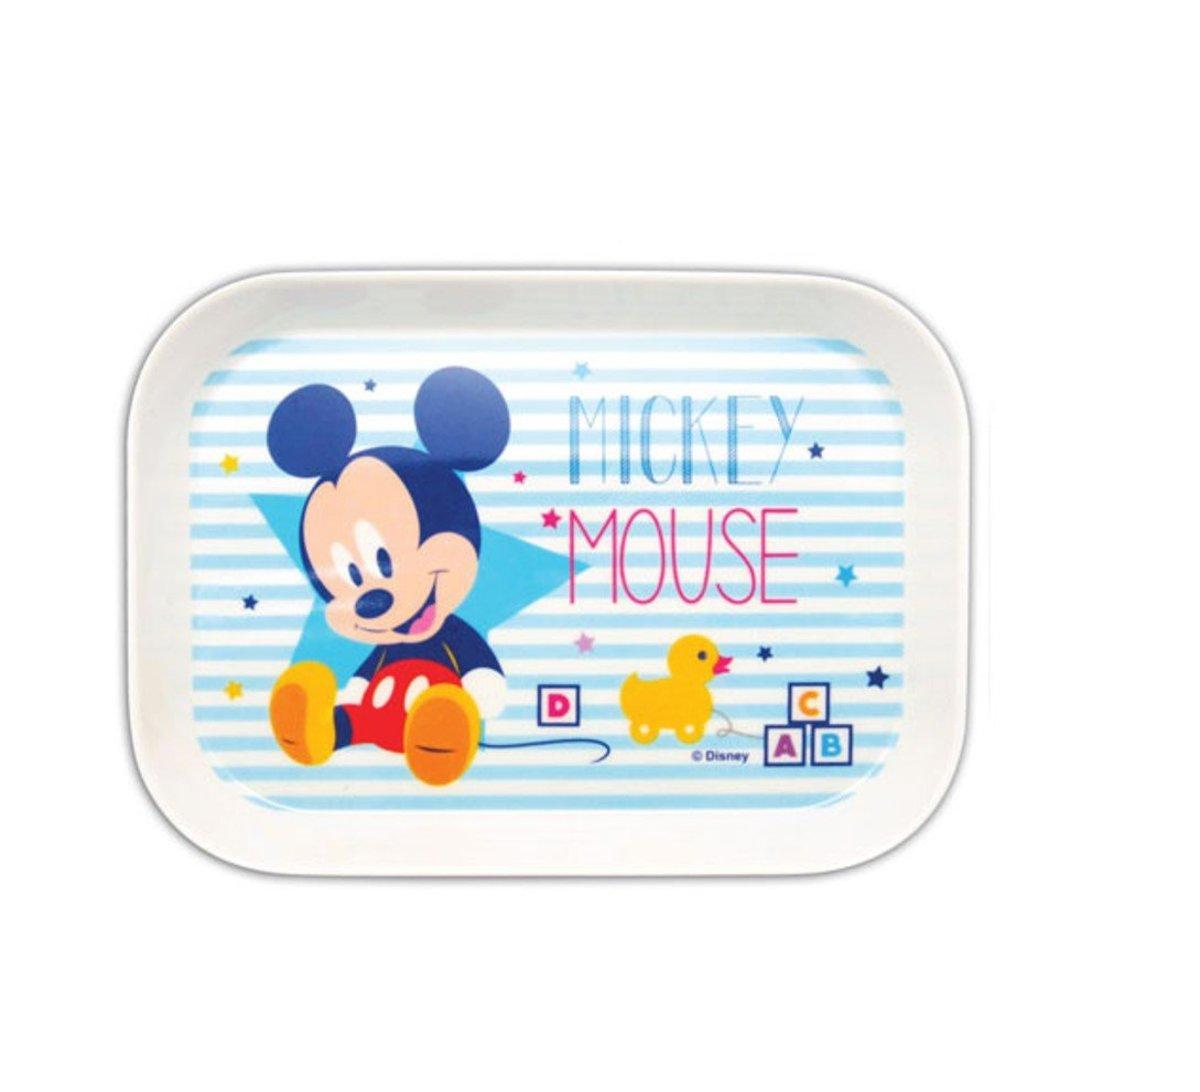 Melamine Tray (S)B(Licensed by Disney)